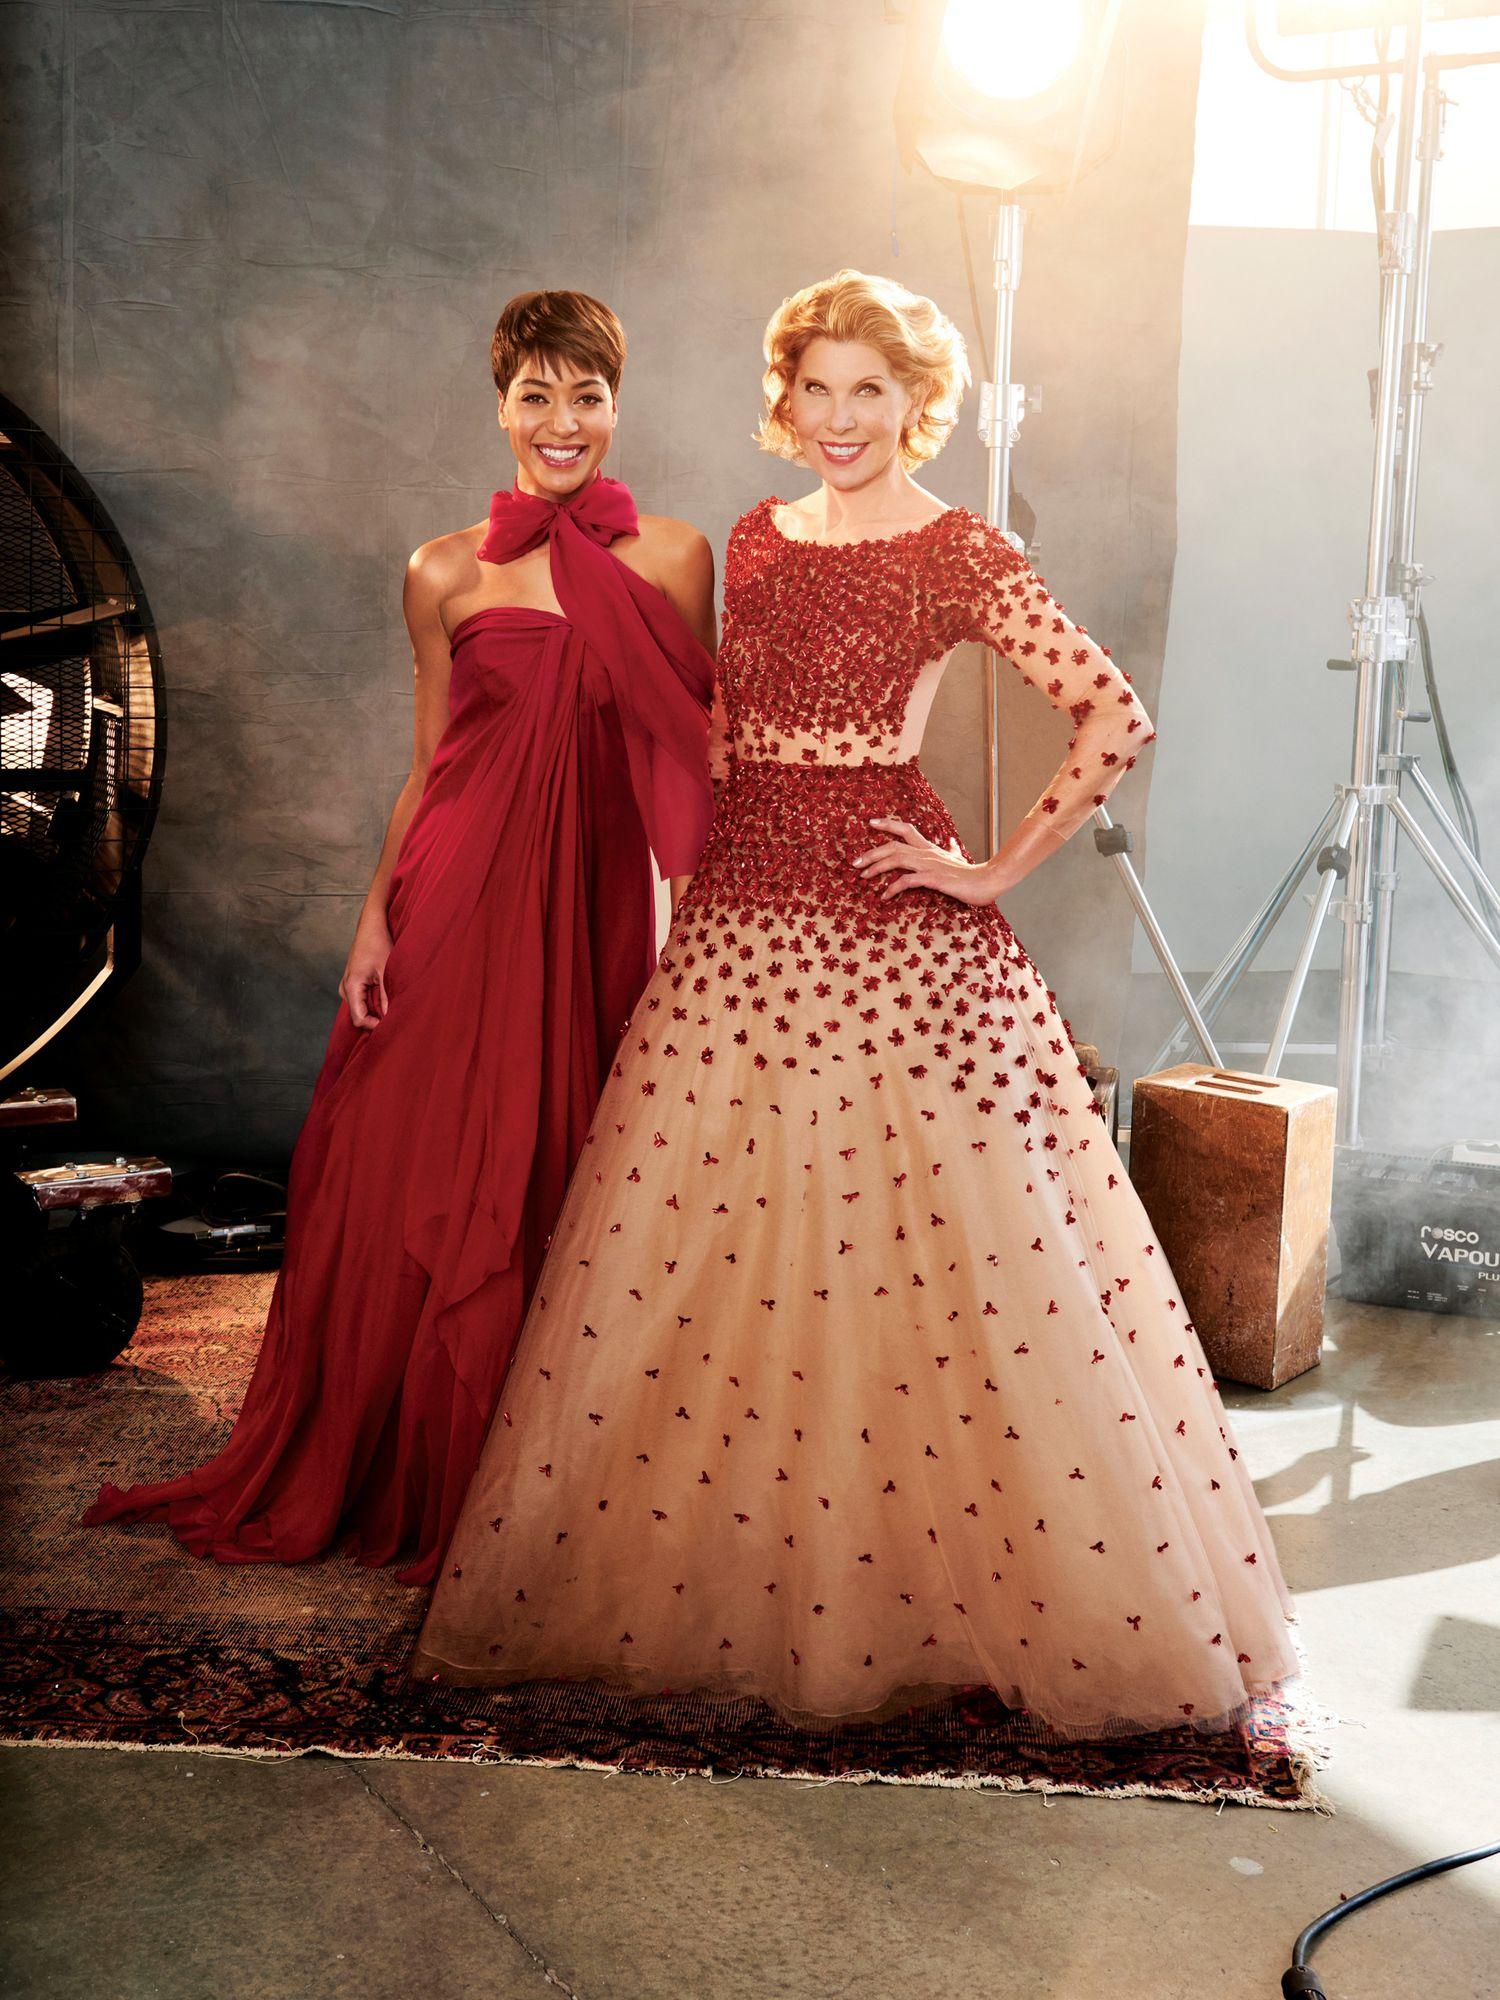 Cush Jumbo and Christine Baranski in red ball gowns.